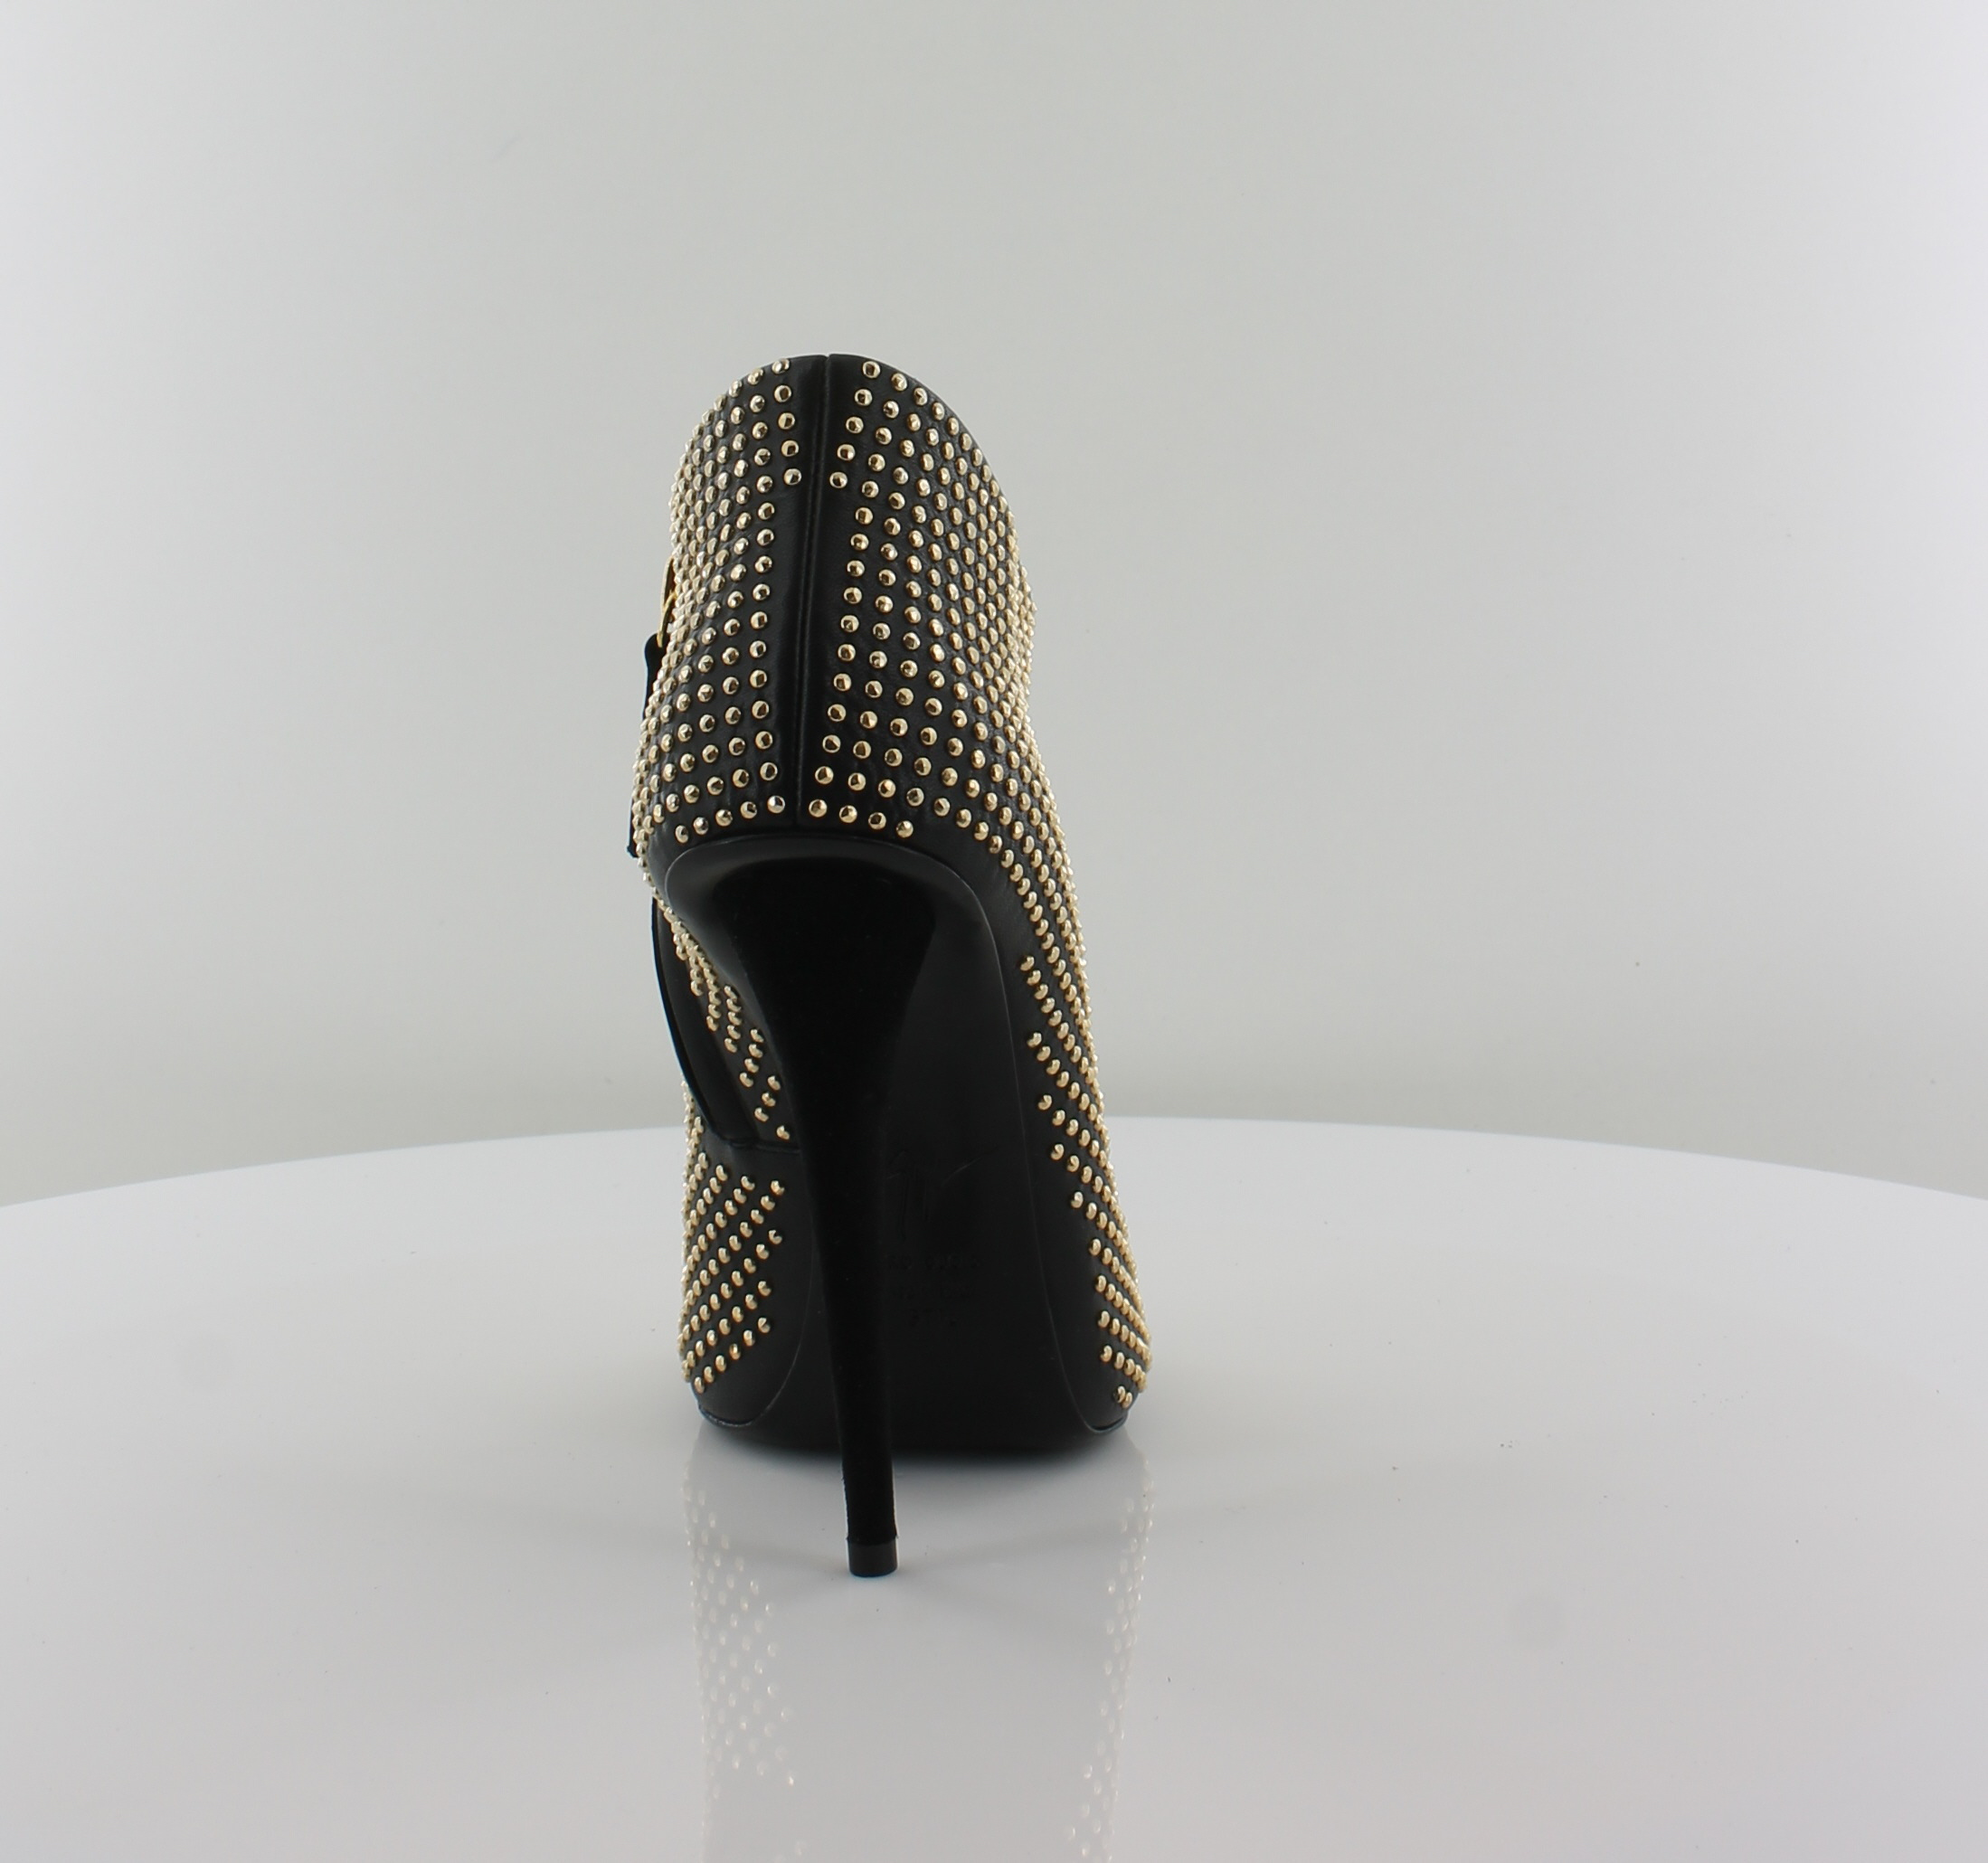 Giuseppe Zanotti Jeti Women's Heels Nero Size 7.5 M